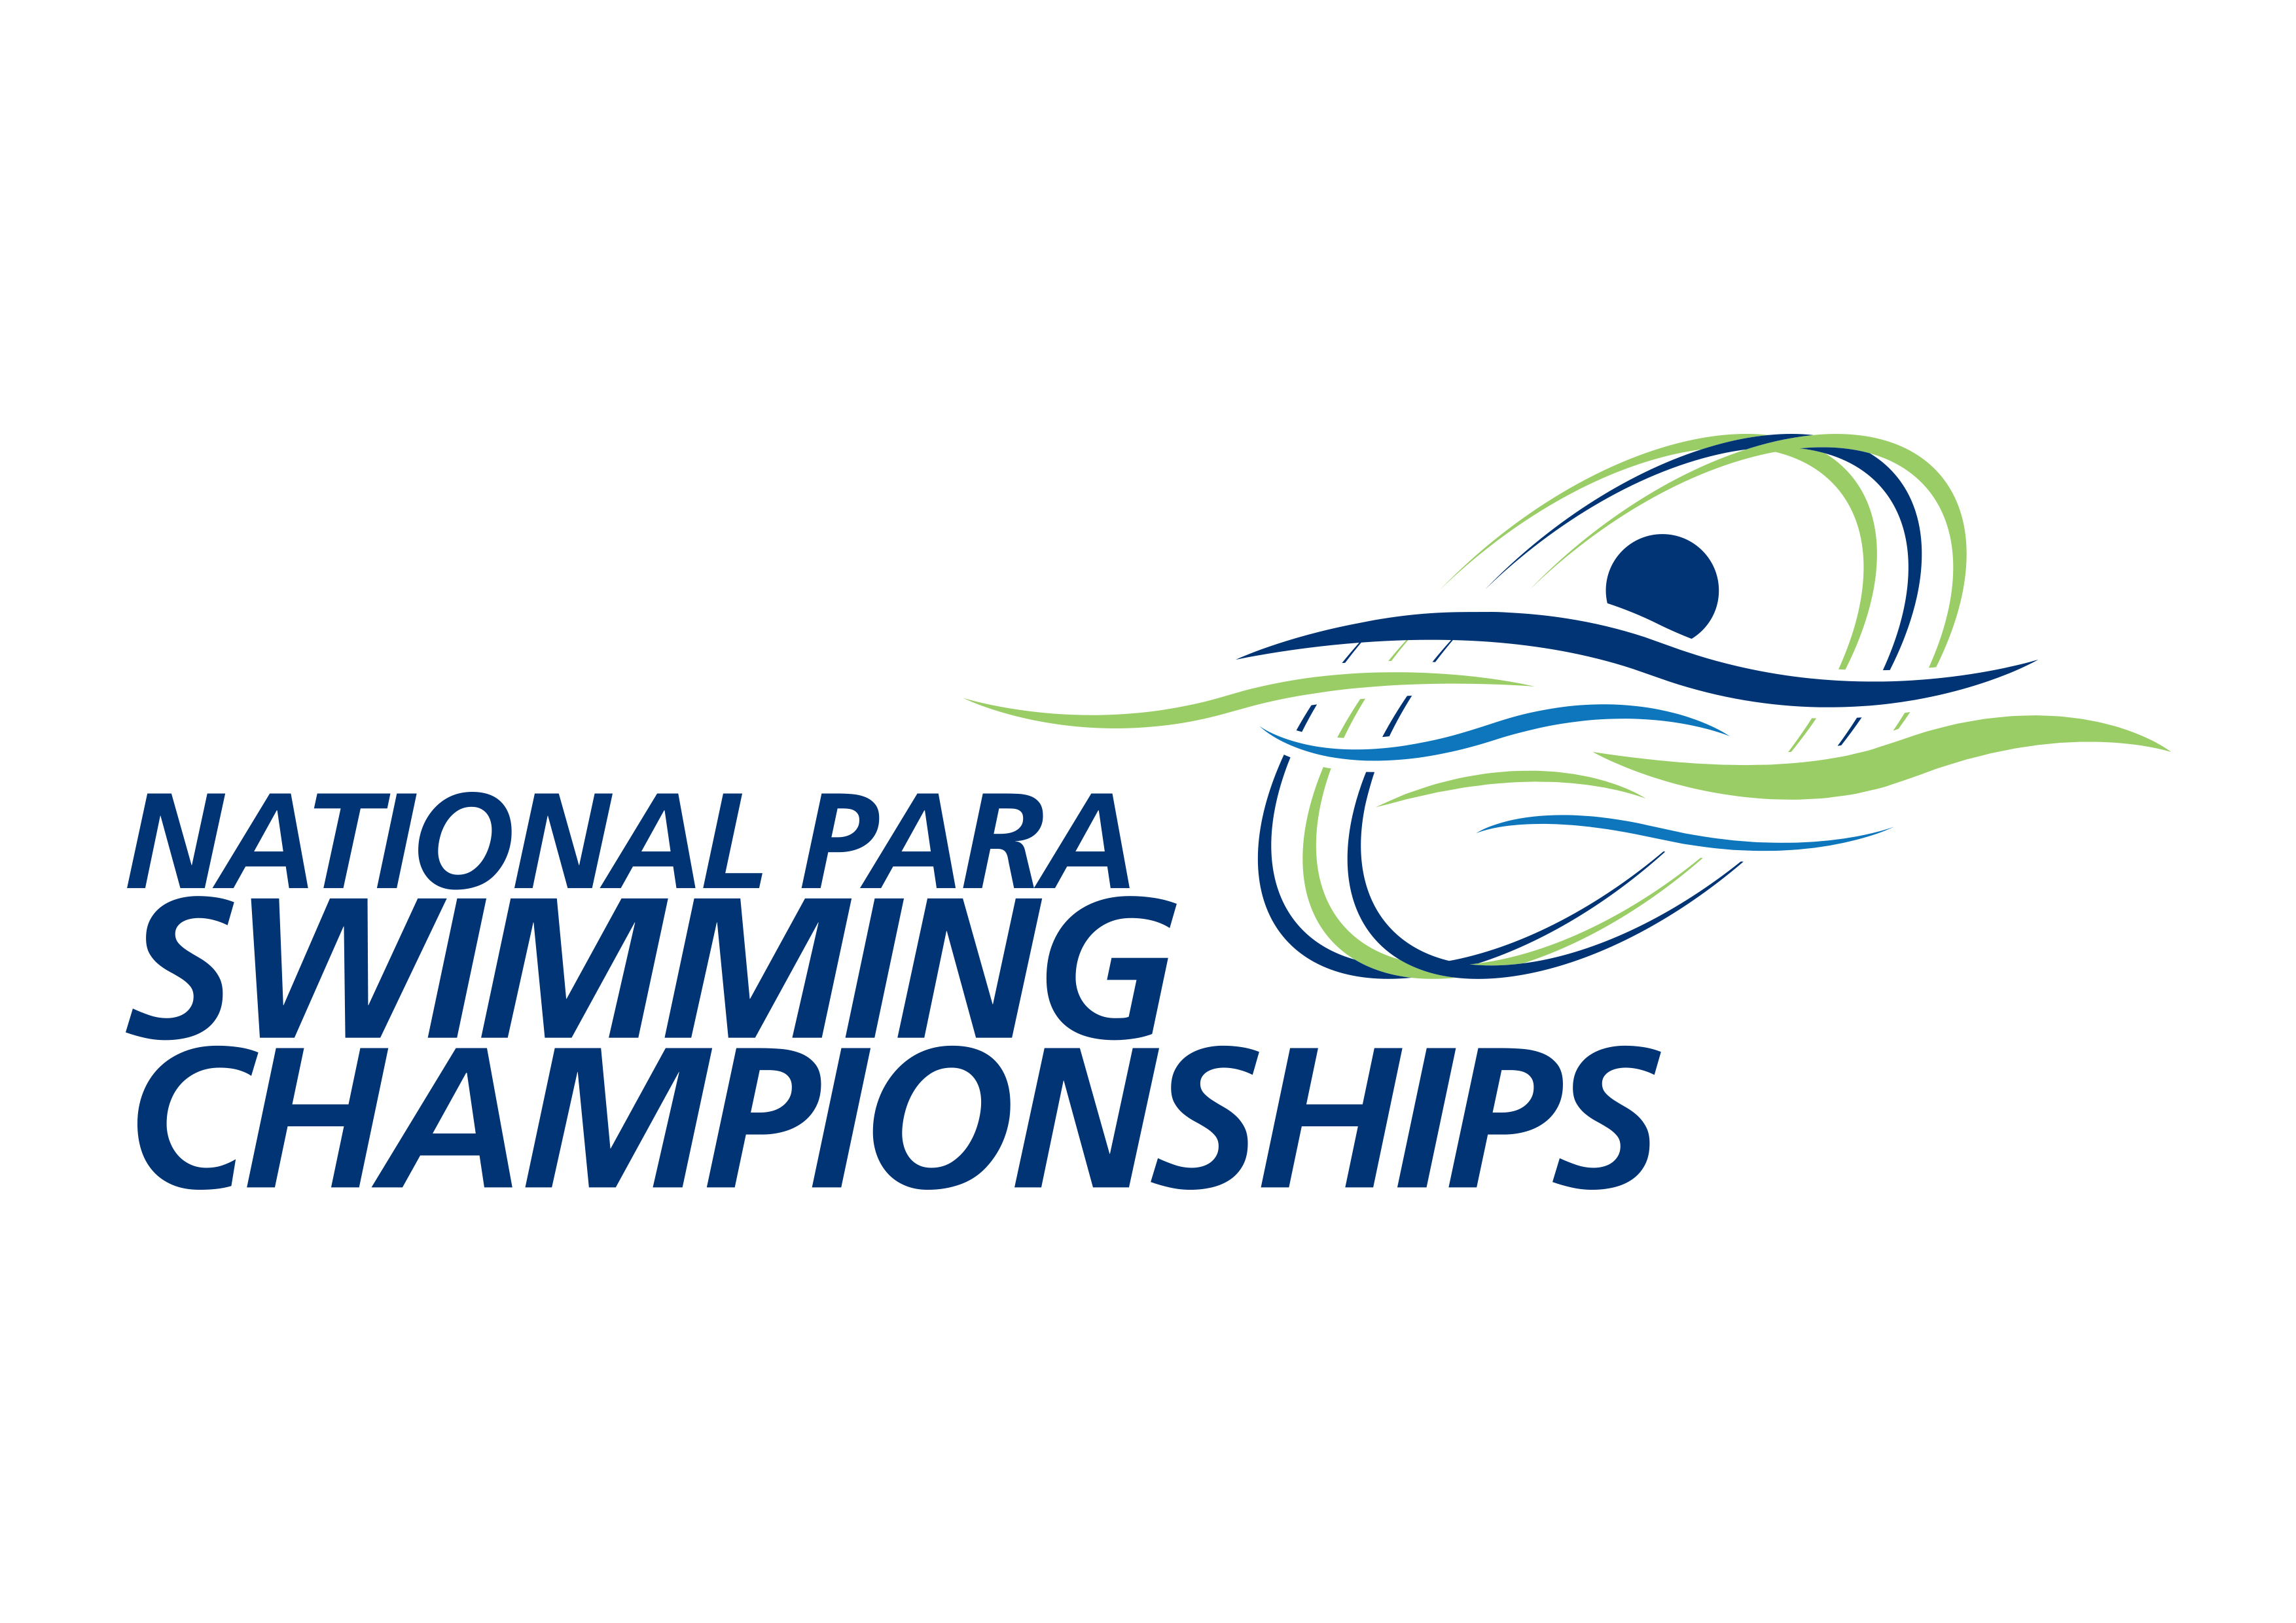 National-Para-Swimming-Championships-Colour